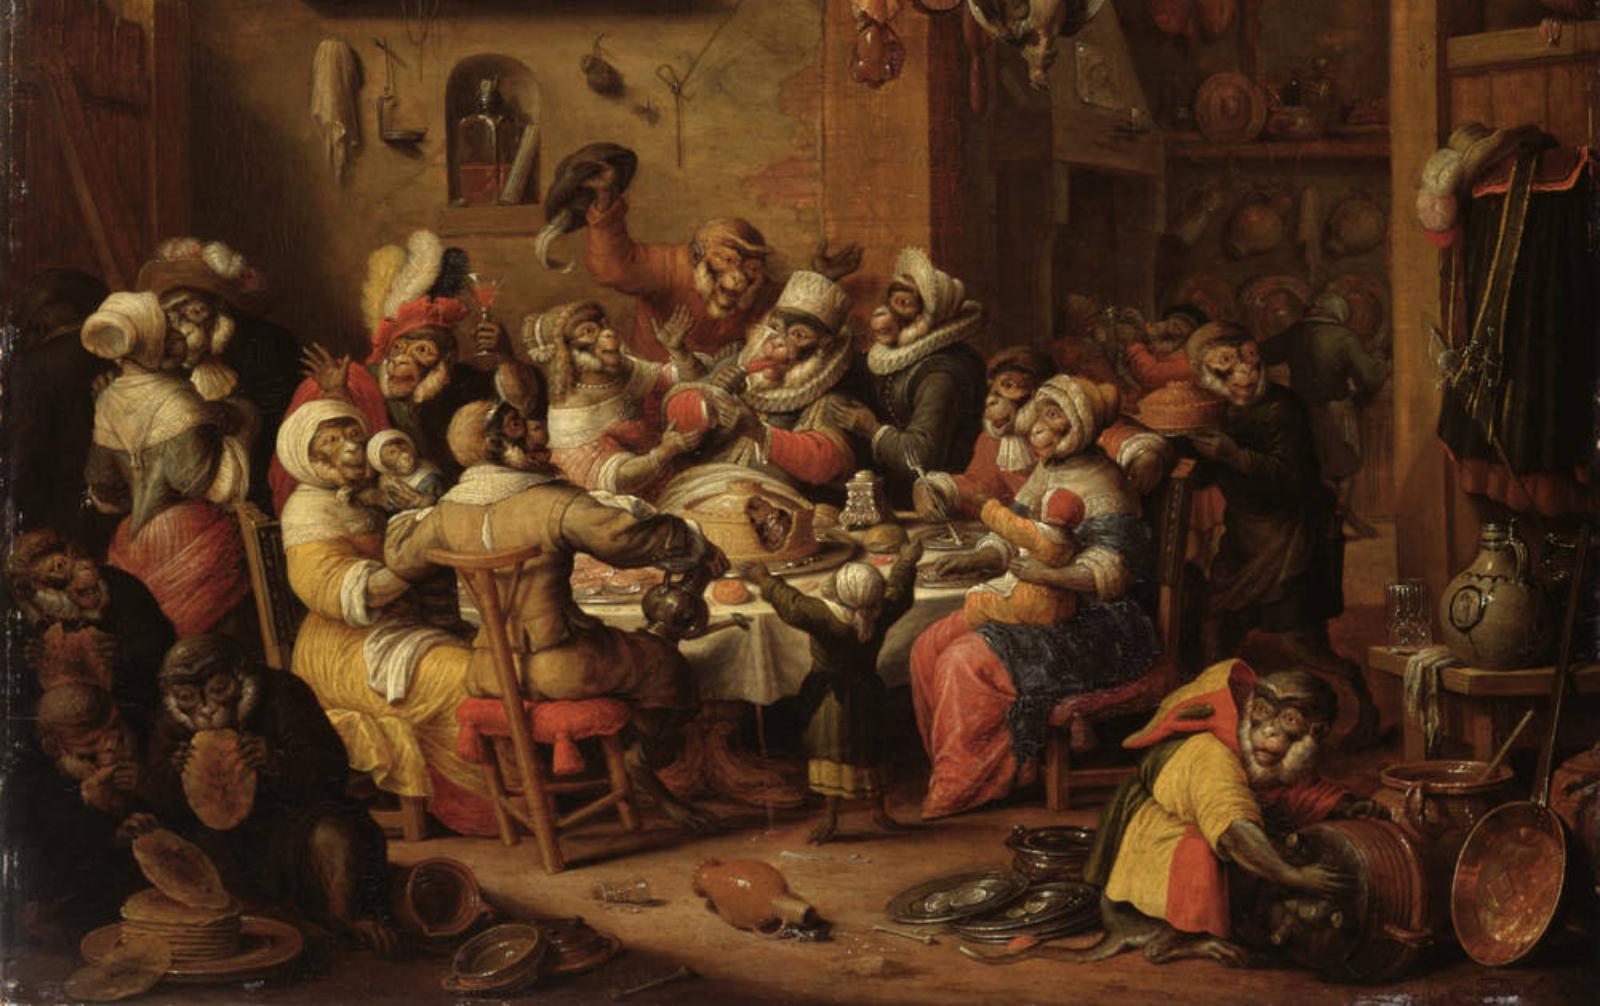 Николас Ван Верендаль. Пир обезьян, или Король пьёт, 1686.